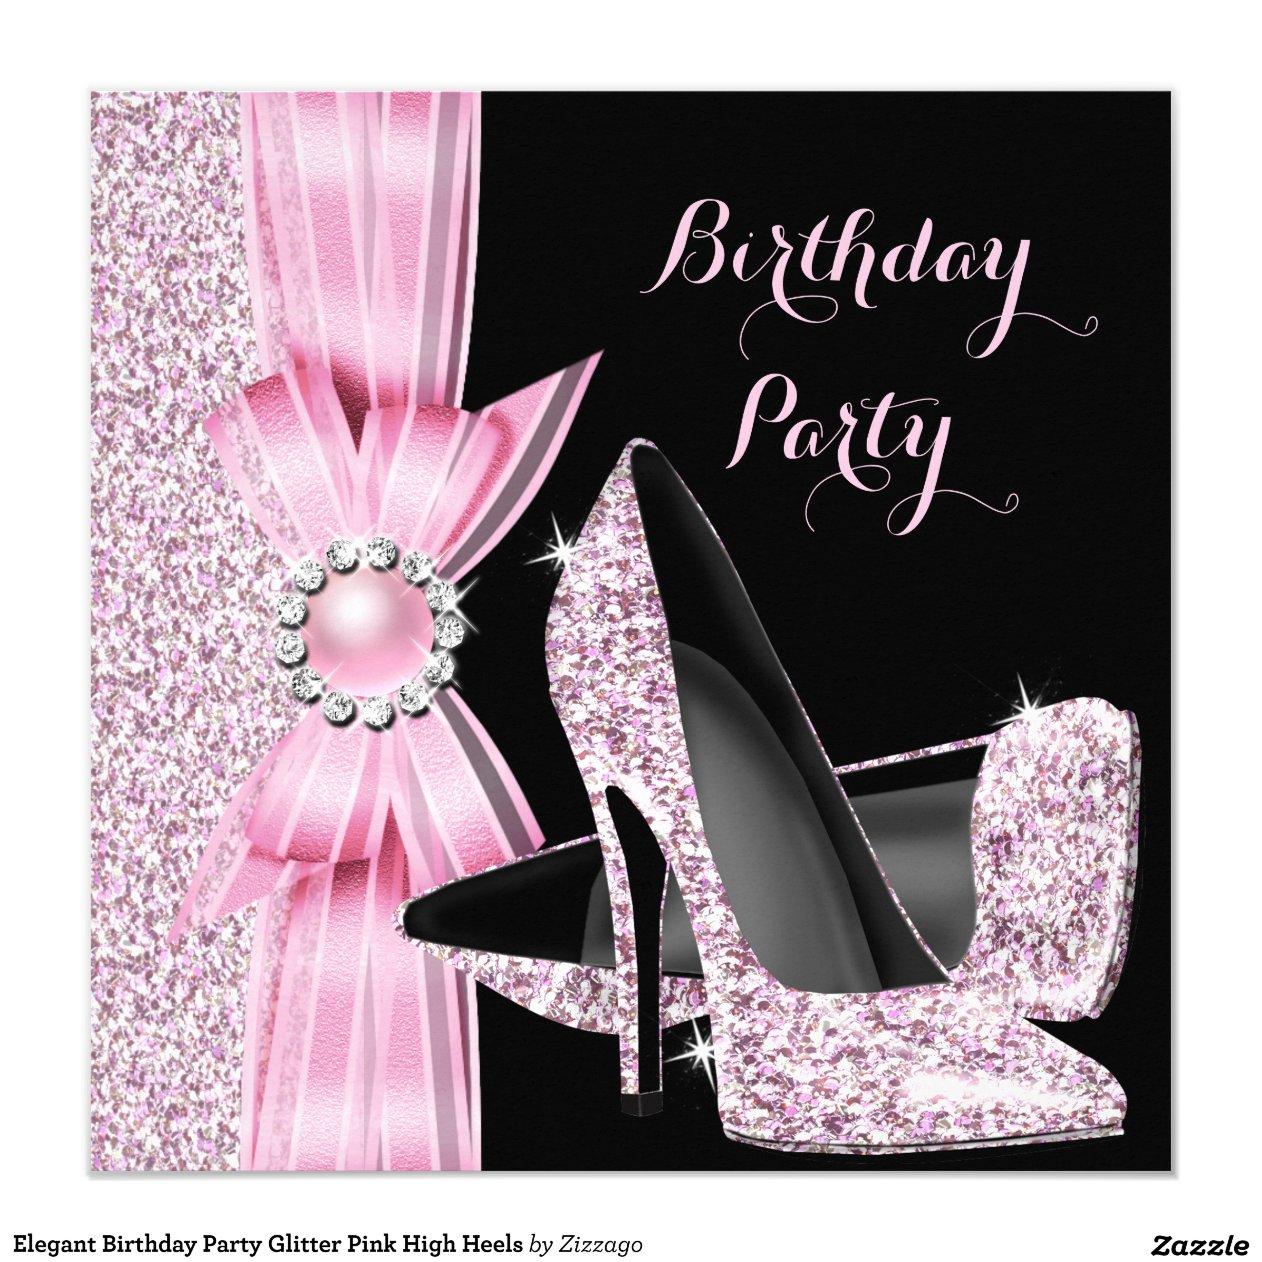 elegant birthday party glitter pink high heels 5 25x5 25